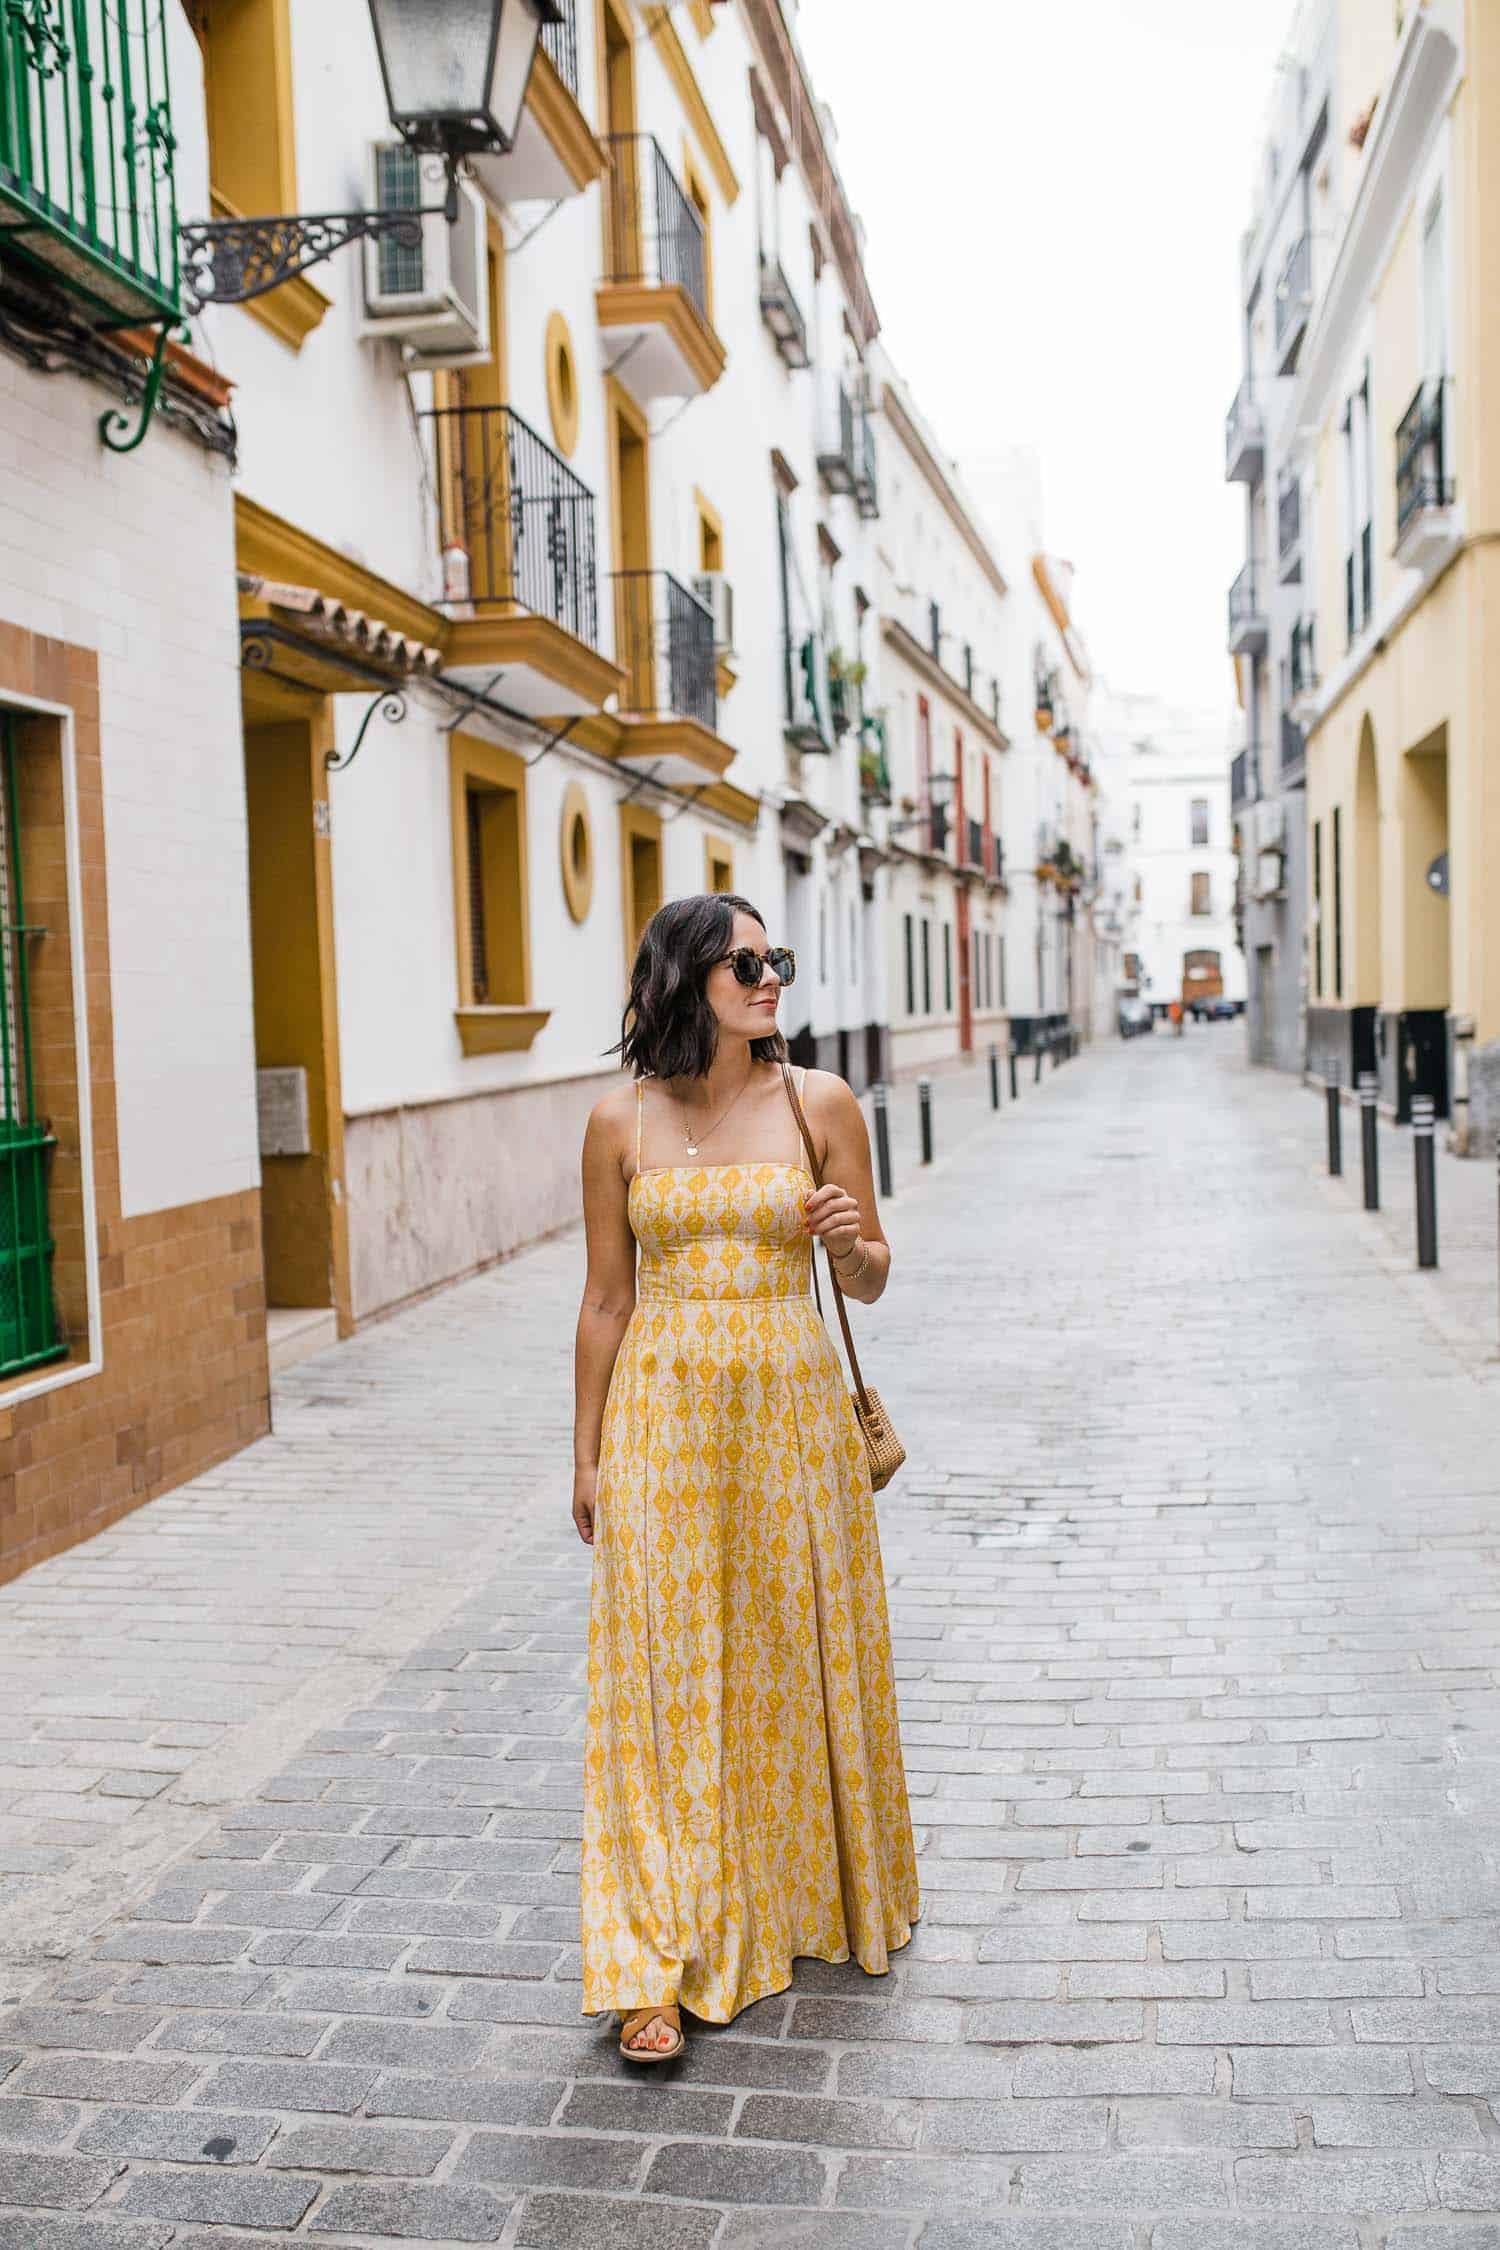 jessica models in Seville